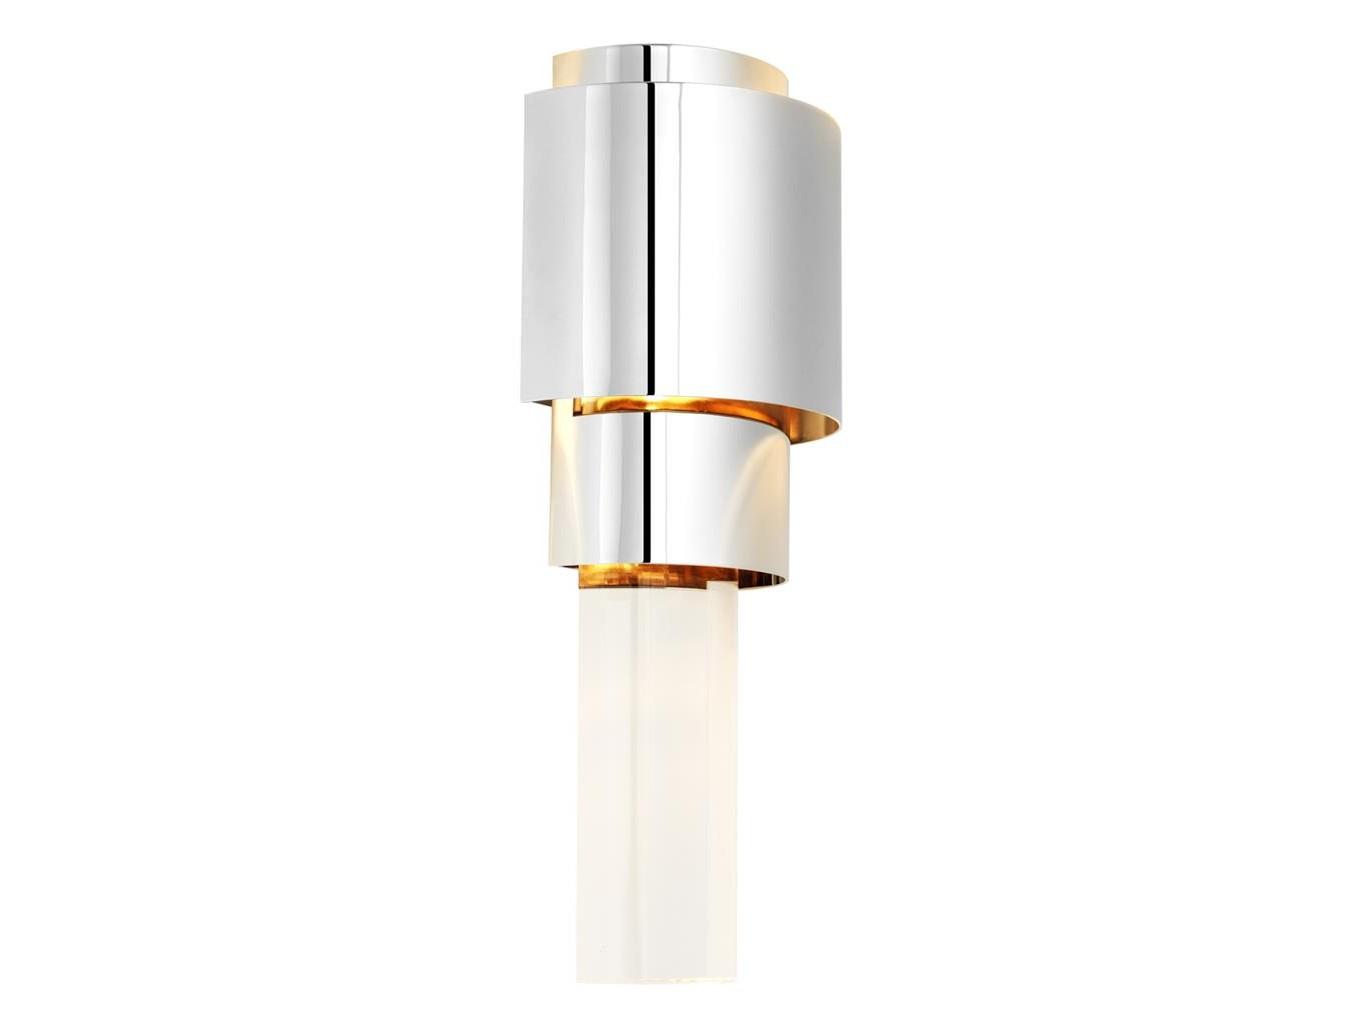 Настенный светильник AvondaleБра<br>&amp;lt;div&amp;gt;Материал: метал, стекло&amp;lt;/div&amp;gt;&amp;lt;div&amp;gt;&amp;lt;br&amp;gt;&amp;lt;/div&amp;gt;&amp;lt;div&amp;gt;&amp;lt;div&amp;gt;Вид цоколя: E14&amp;lt;/div&amp;gt;&amp;lt;div&amp;gt;Мощность:&amp;amp;nbsp; 40W&amp;lt;/div&amp;gt;&amp;lt;div&amp;gt;Количество ламп: 2 (нет в комплекте)&amp;lt;/div&amp;gt;&amp;lt;/div&amp;gt;<br><br>Material: Металл<br>Ширина см: 15.0<br>Высота см: 37.0<br>Глубина см: 10.0